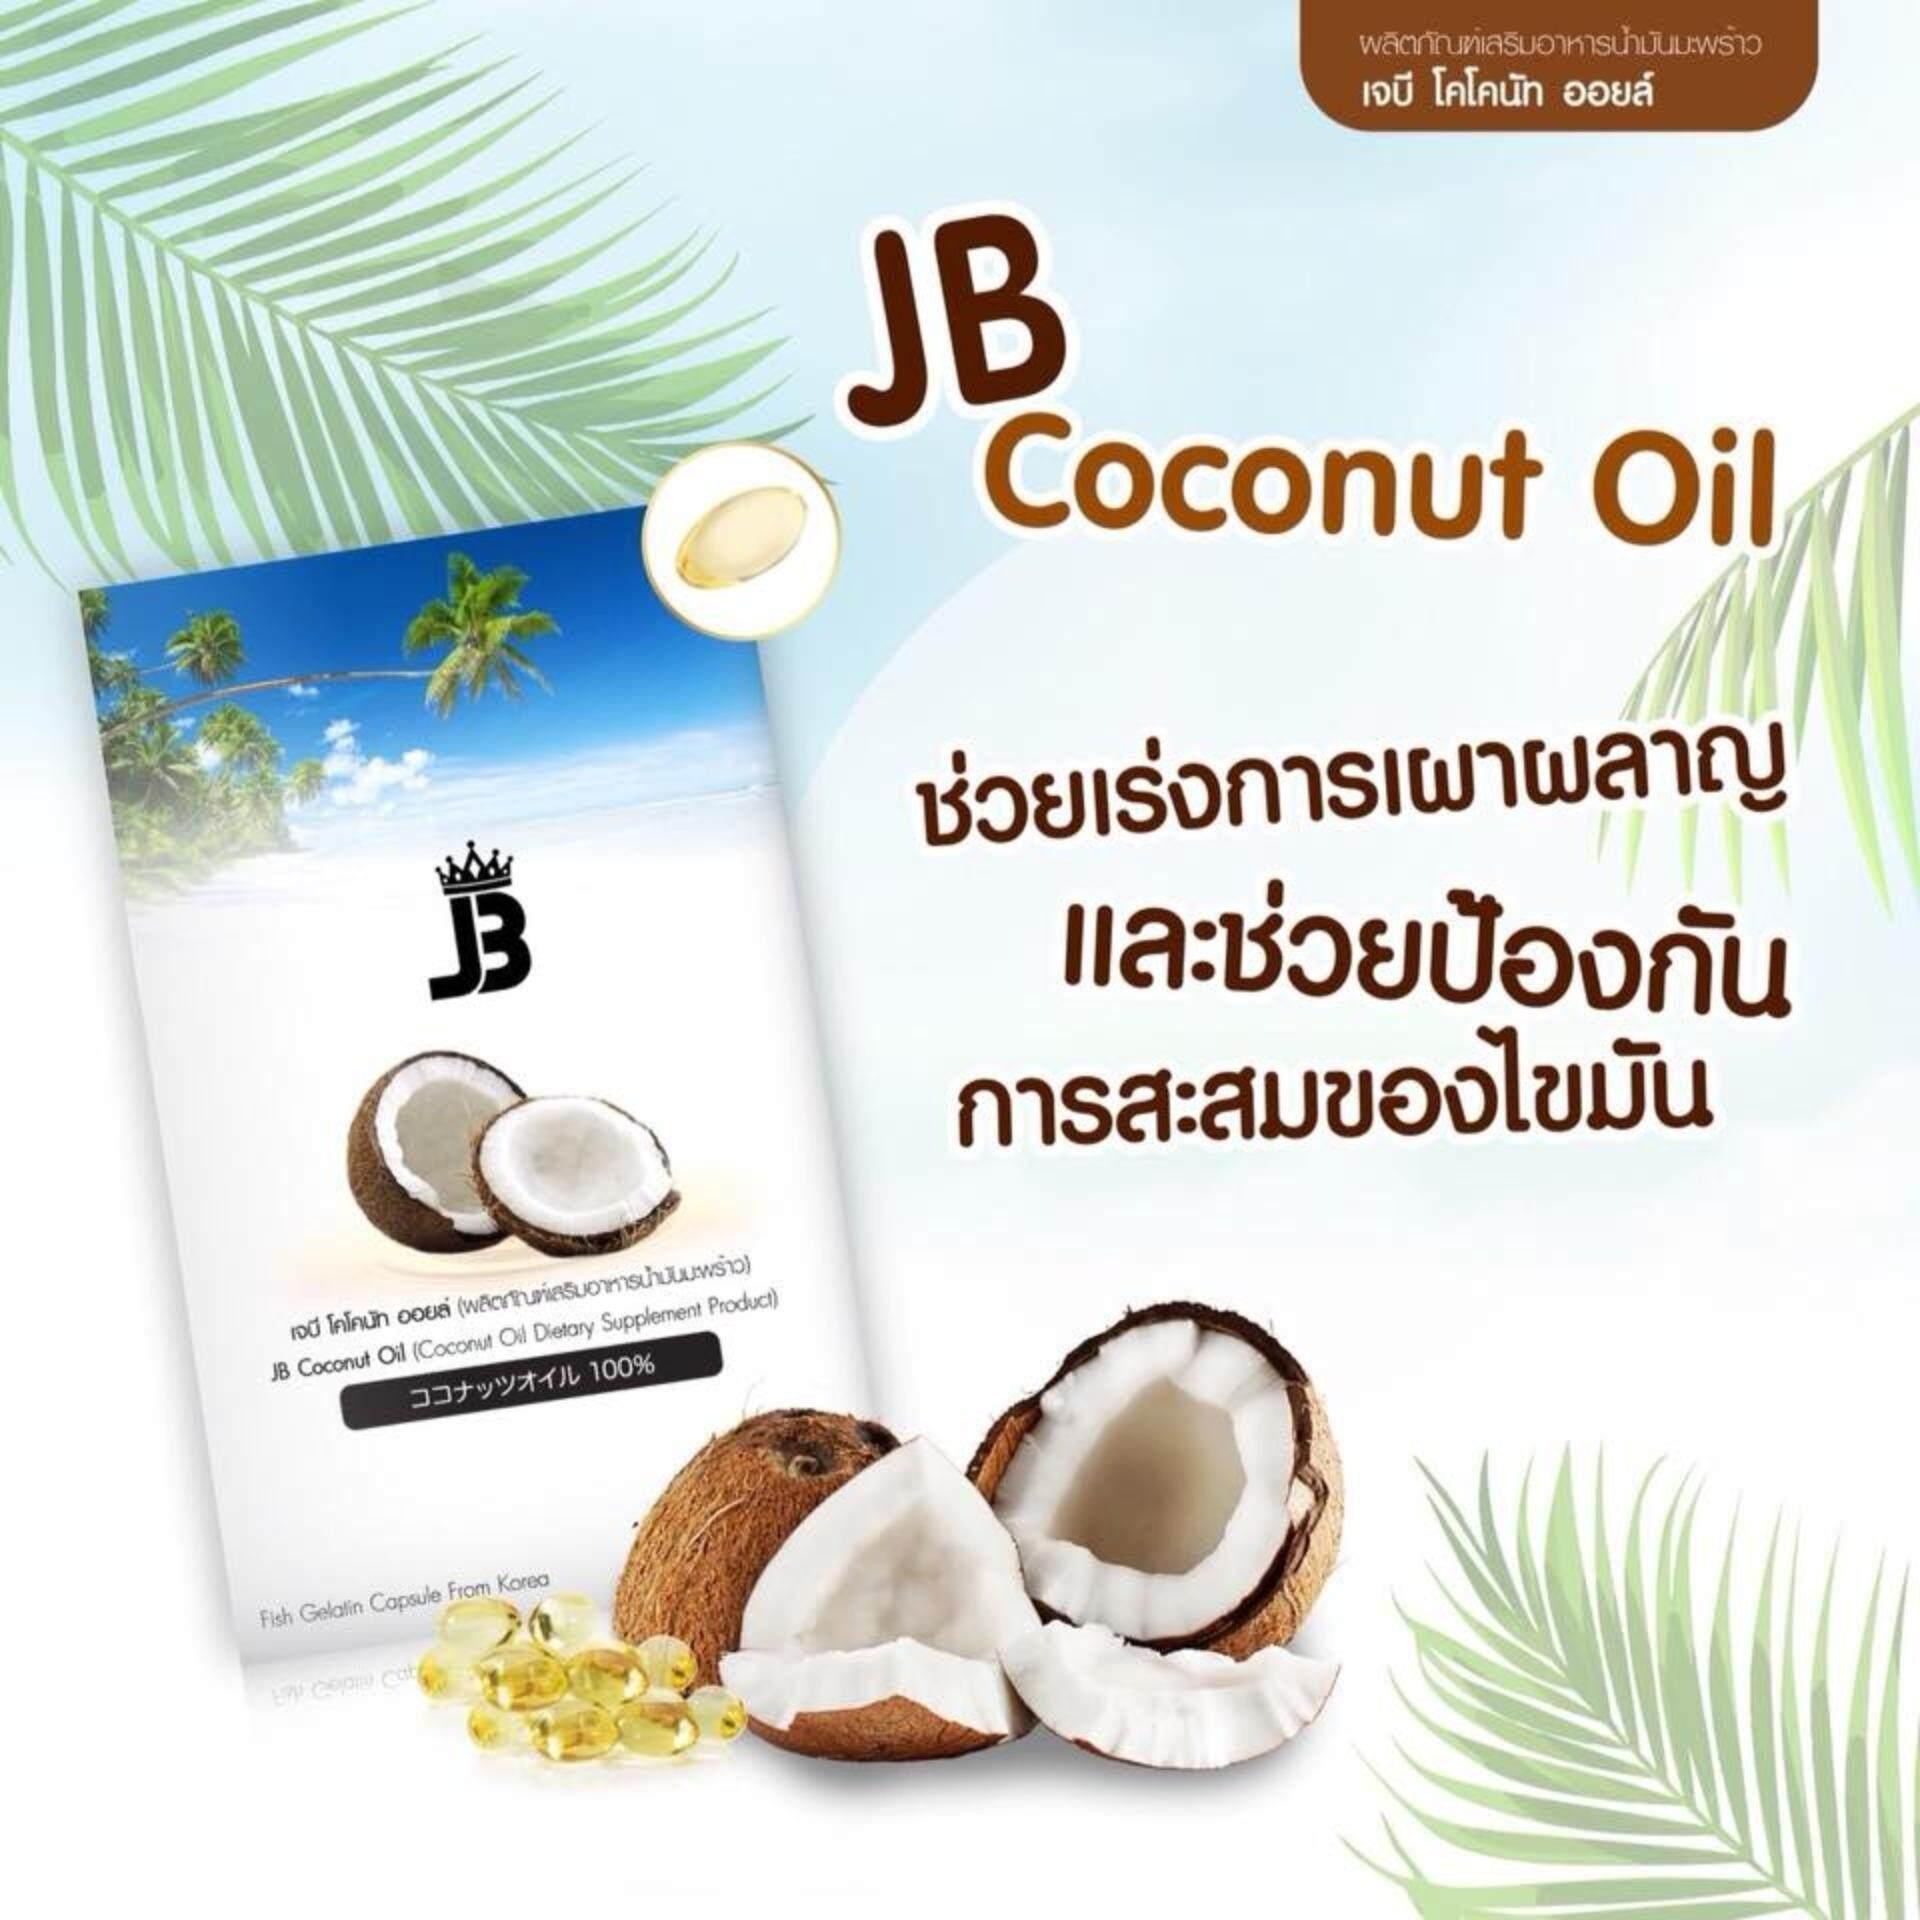 Jb Coconut Oil เจบี โคโคนัท ออยล์ ซอฟล์เจล น้ำมันจากปลา บำรุงผิว บำรุงเส้นผม ขนาด 60 แคปซูล (1 กล่อง) By 168 Thai Shop.